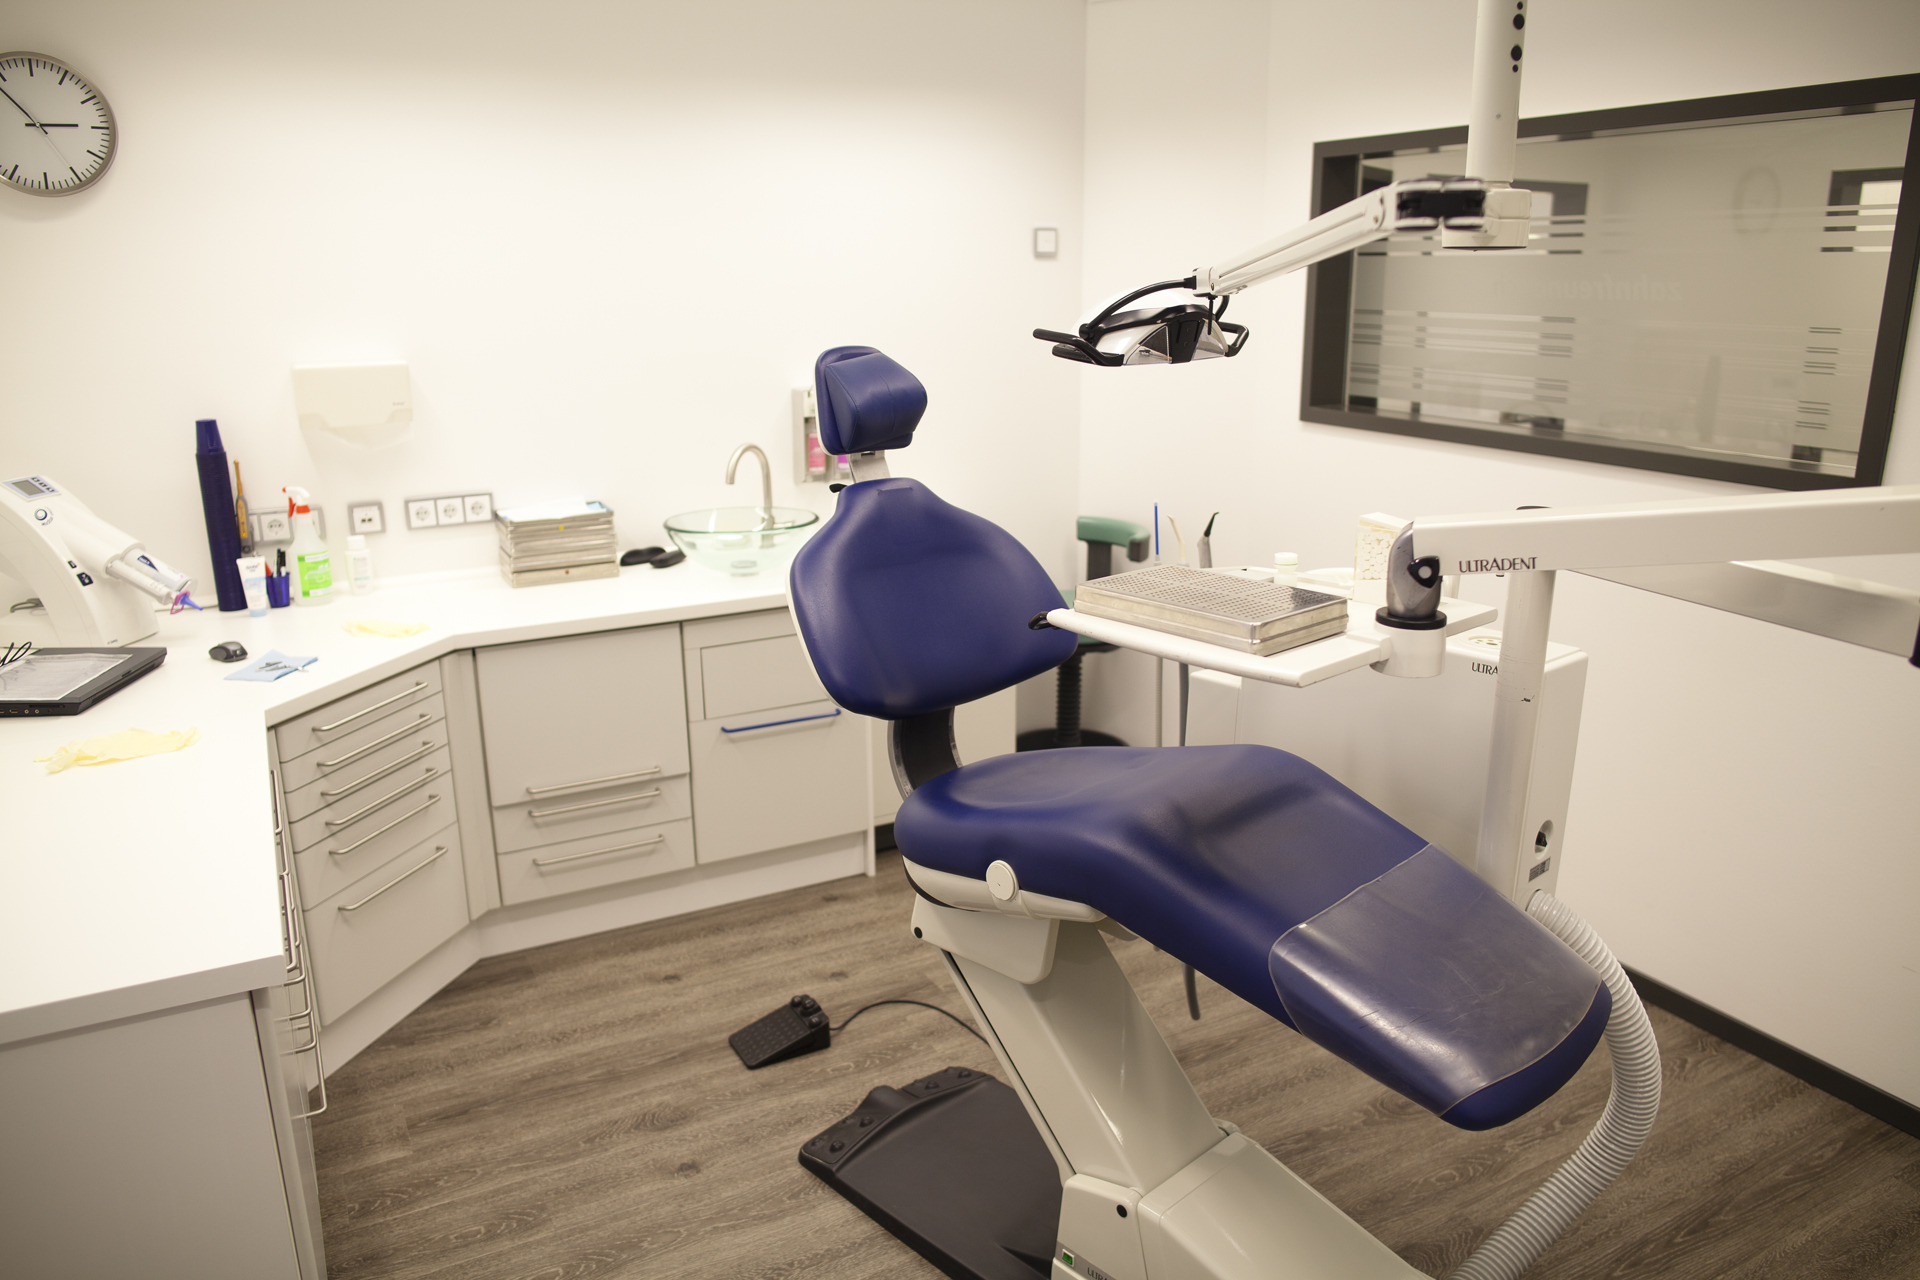 Zahnarzt Rothmaler 120_b